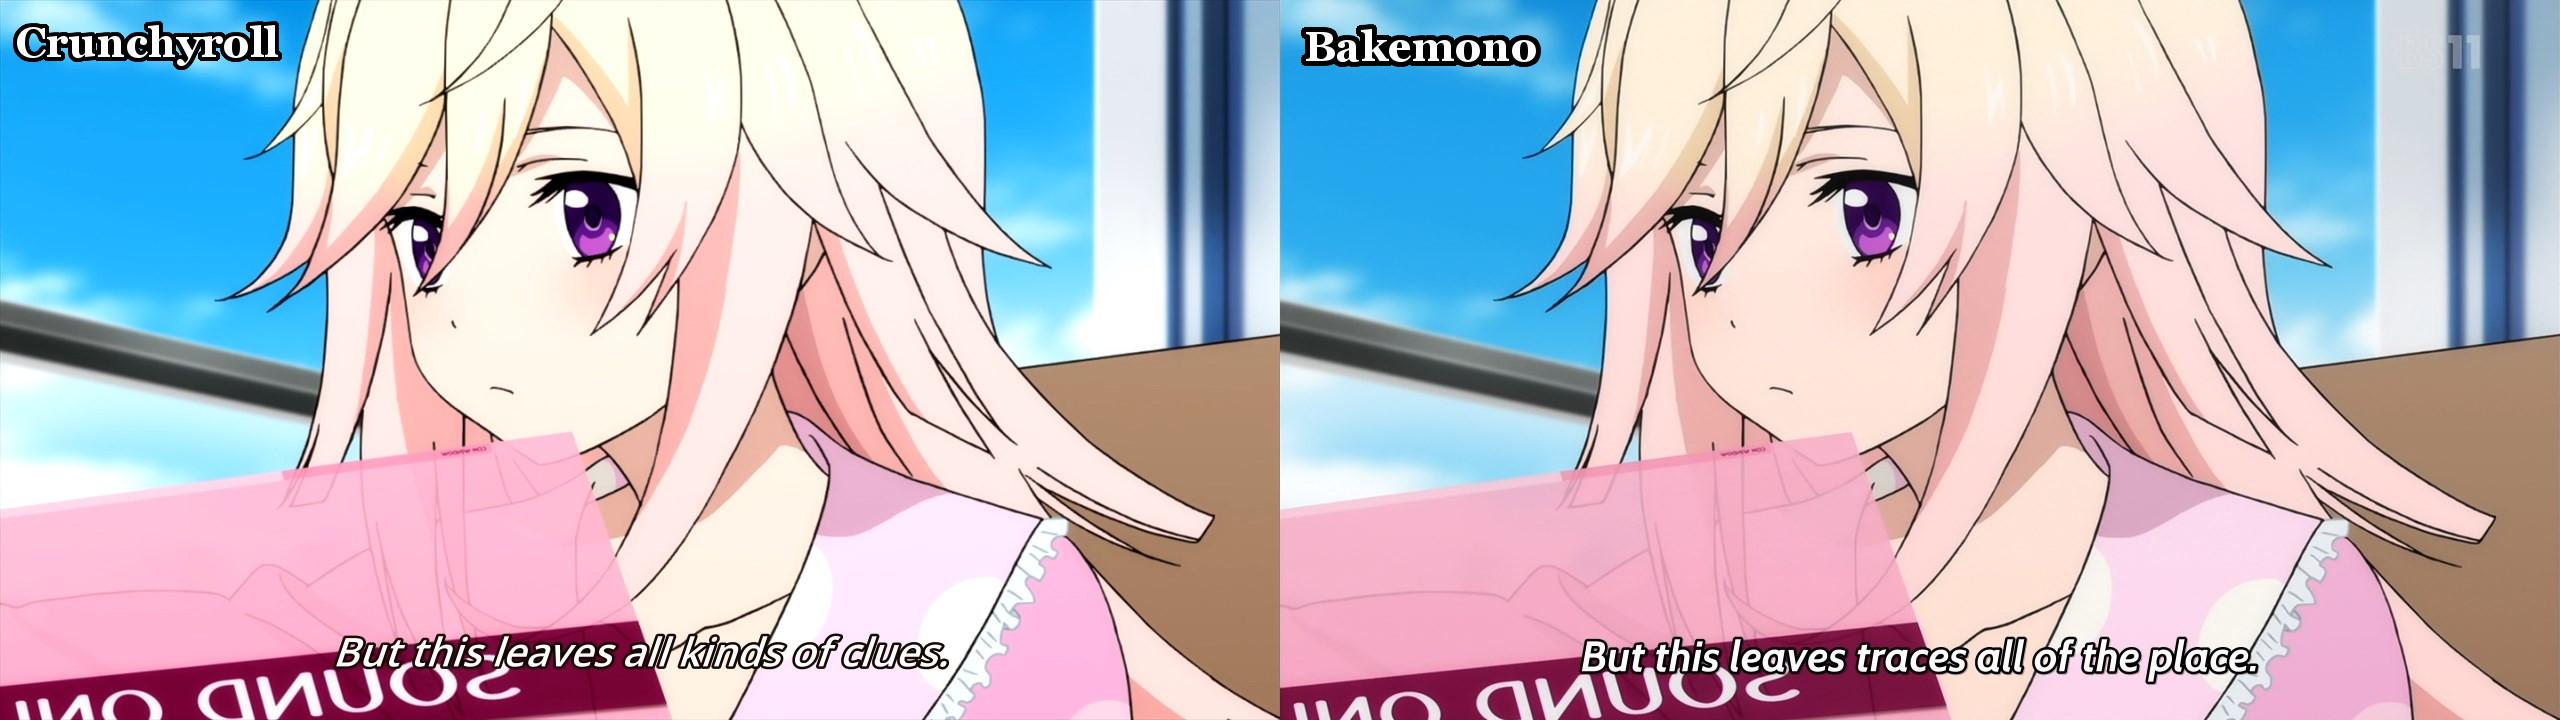 crunchyroll_versus_bakemono_-_trickster_-_788z